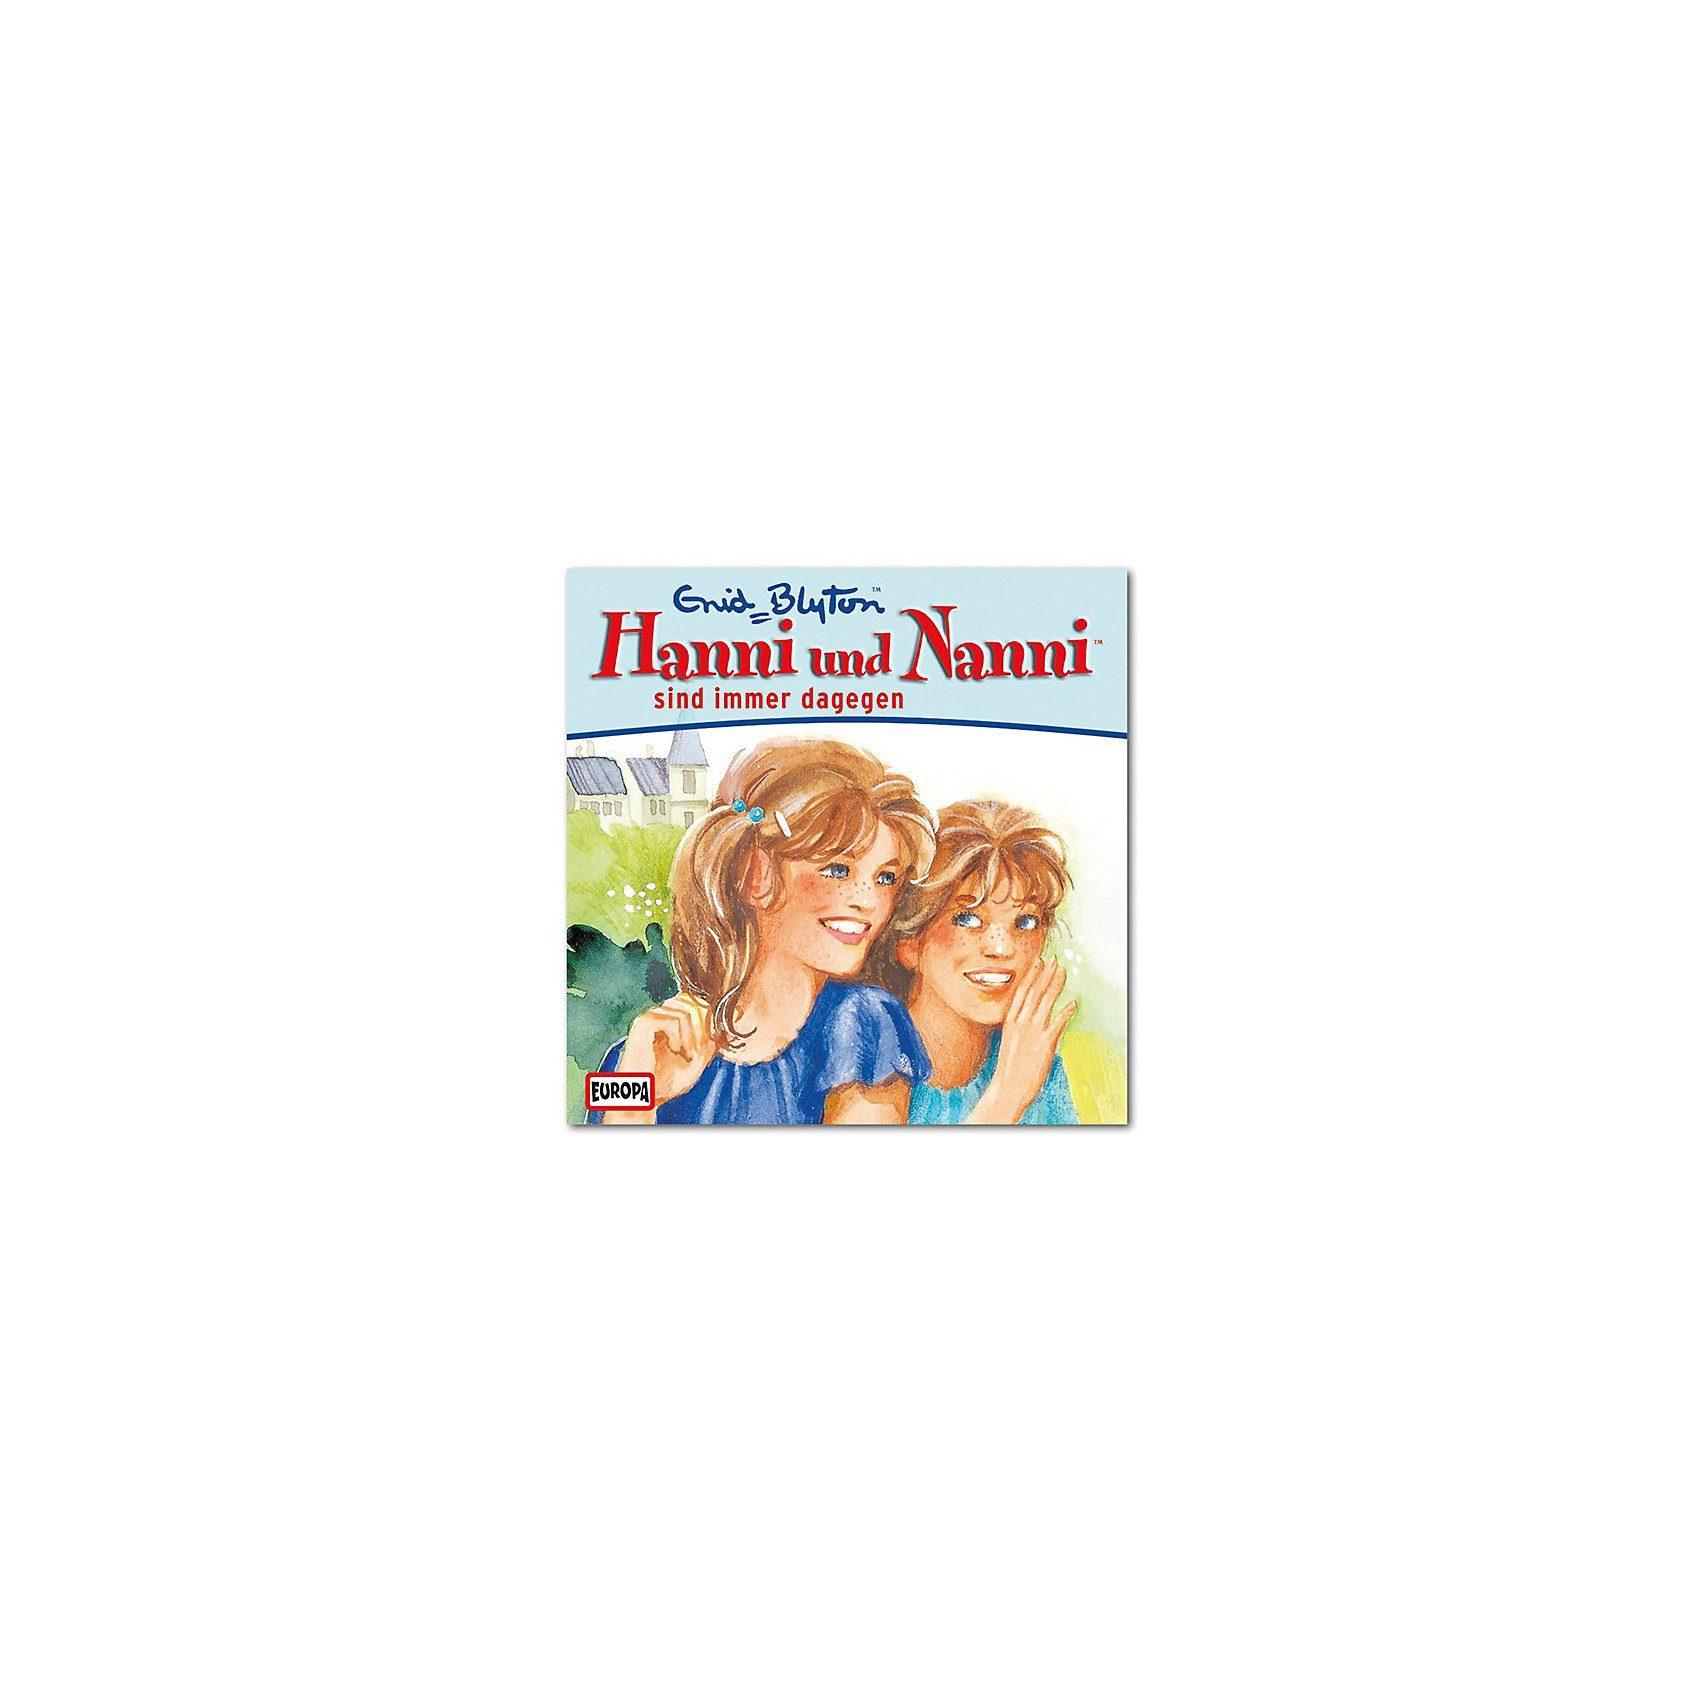 Sony CD Hanni & Nanni 01 - sind immer dagegen